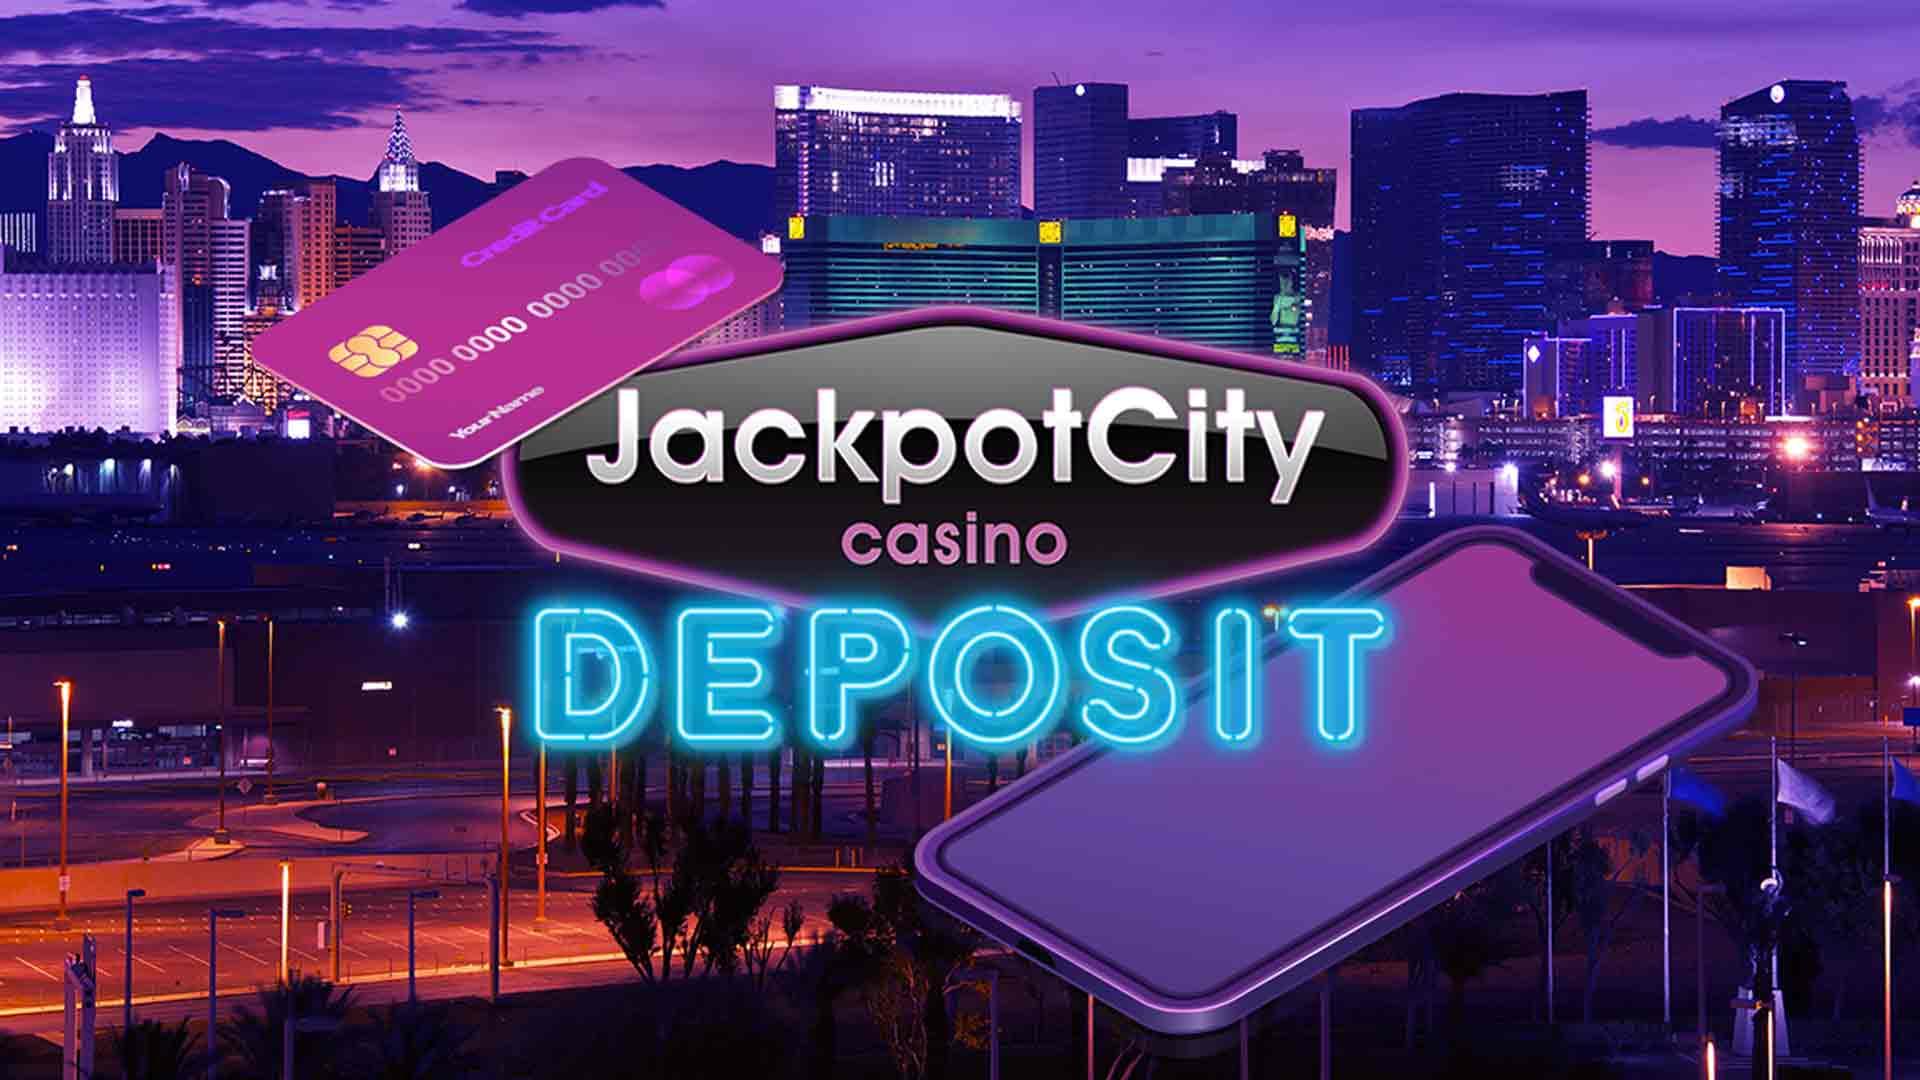 jackpot city deposit